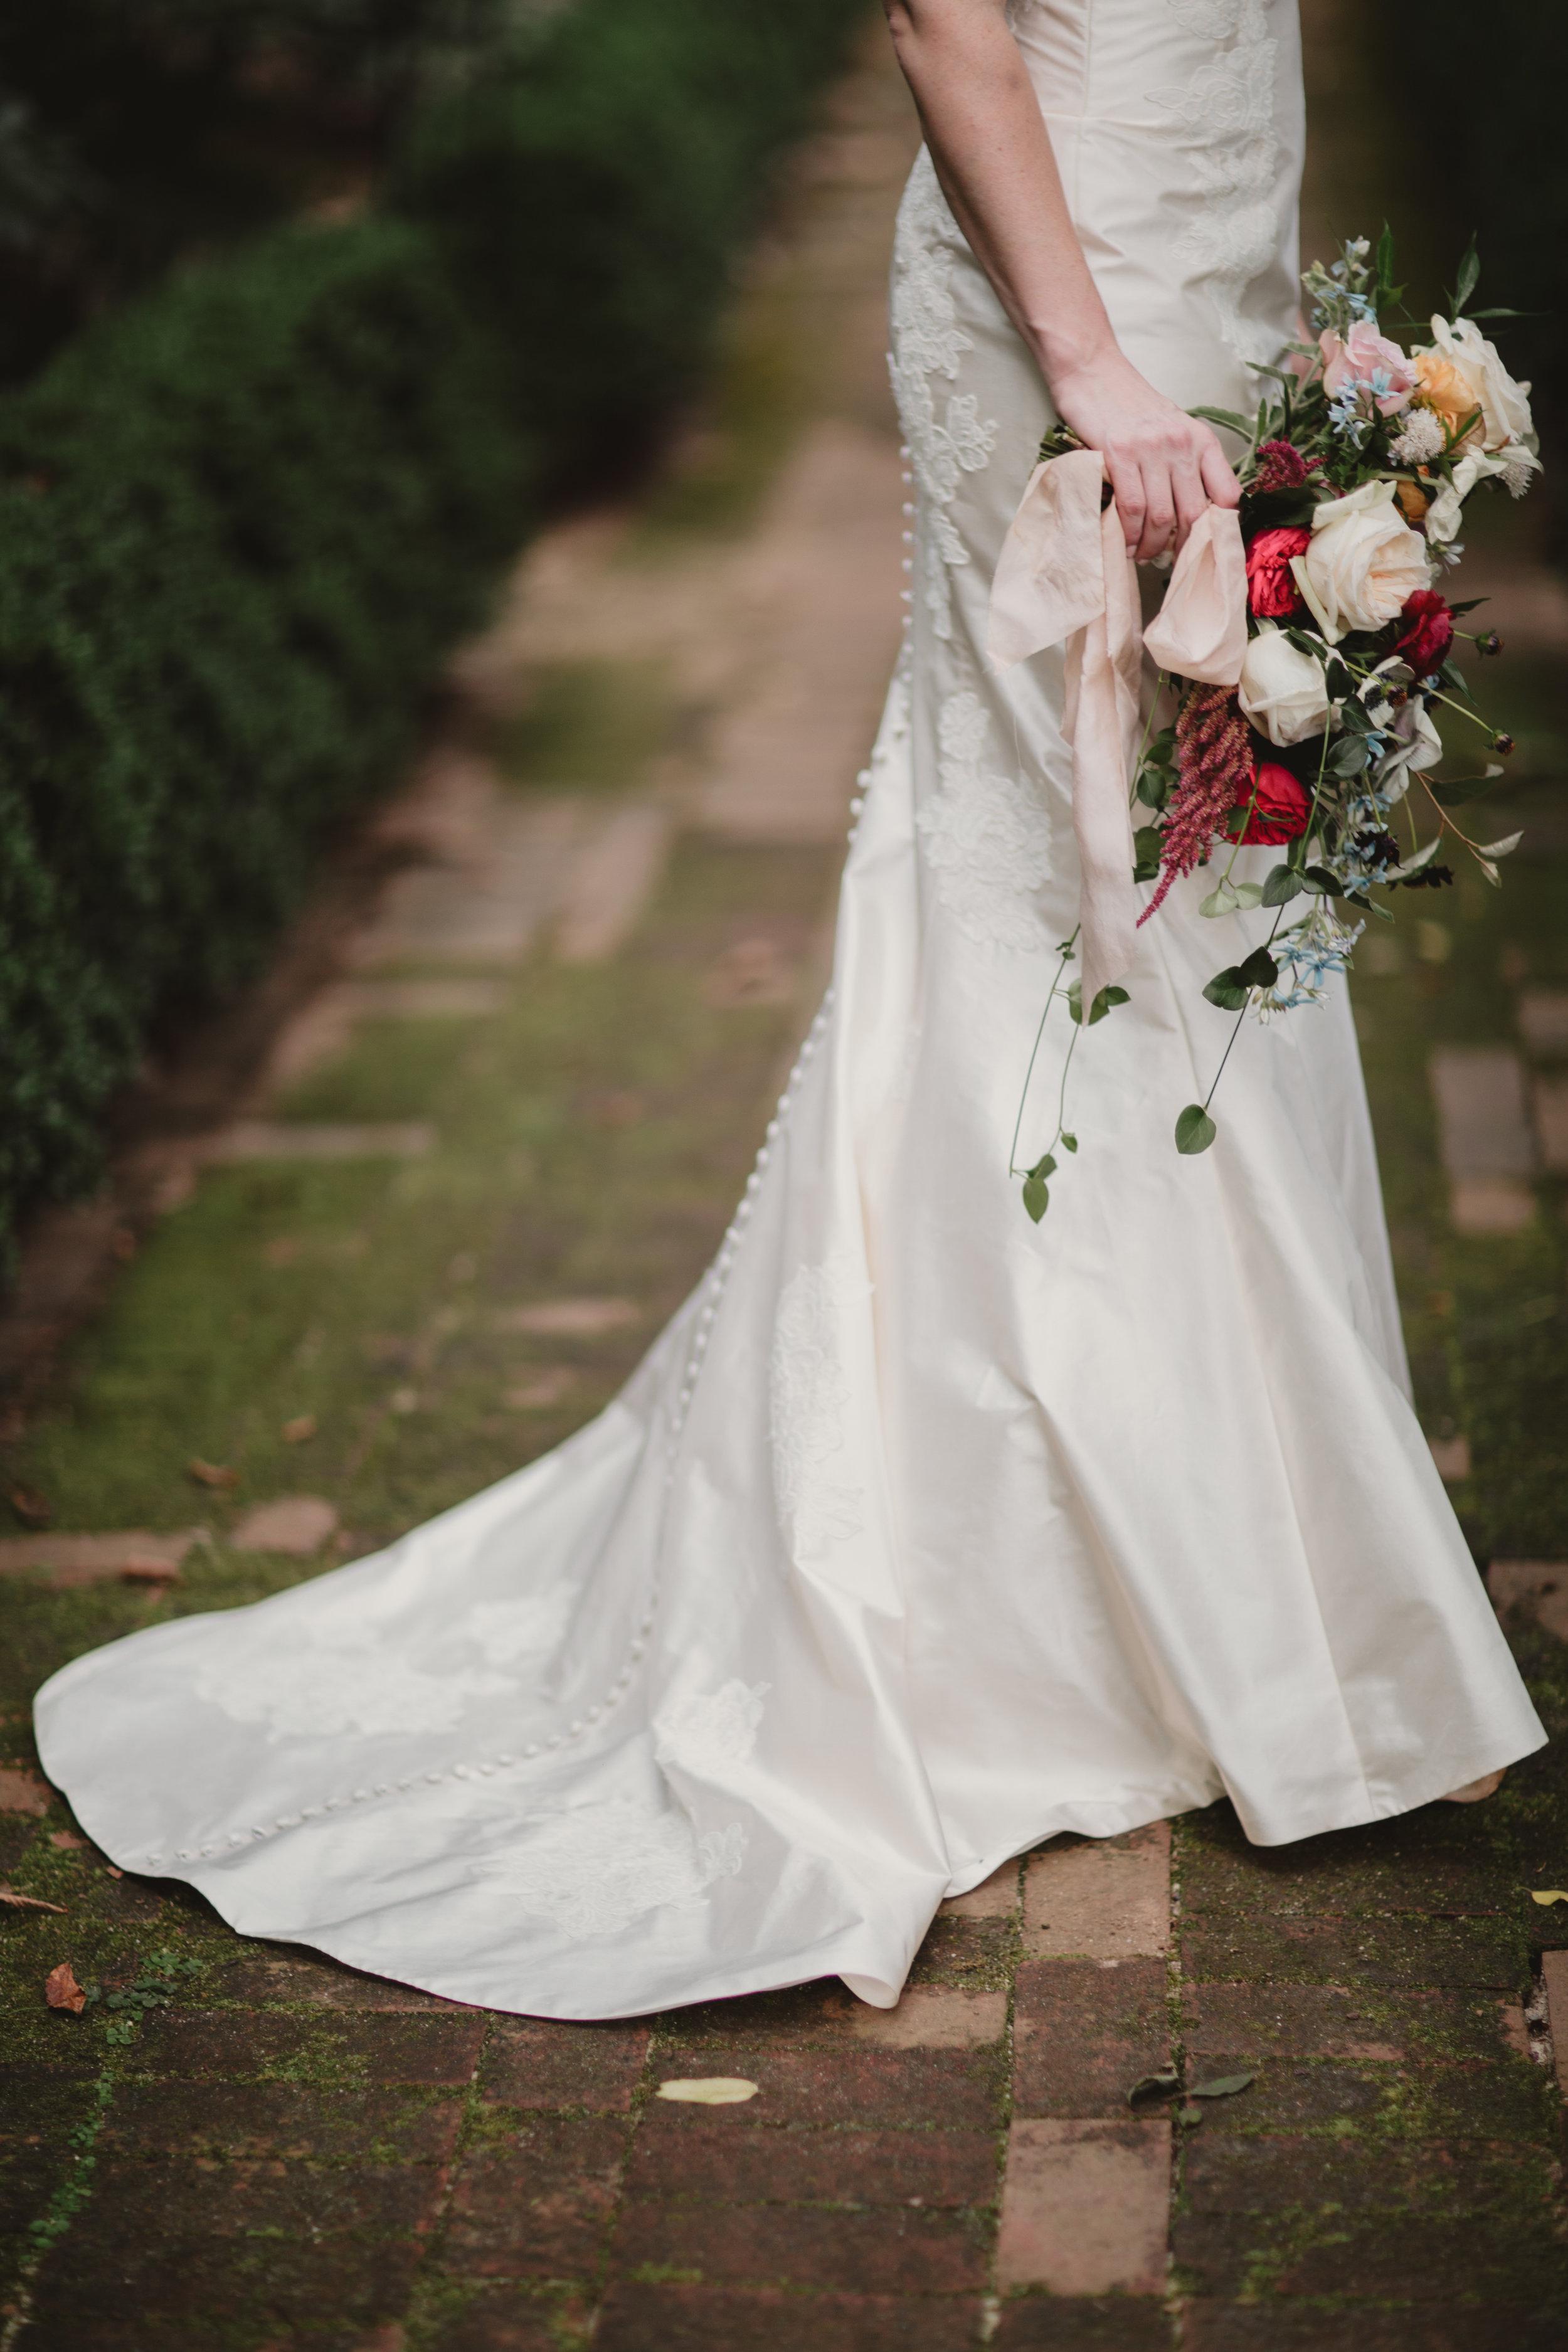 AliceBridals - Alicia White Photography-32.jpg